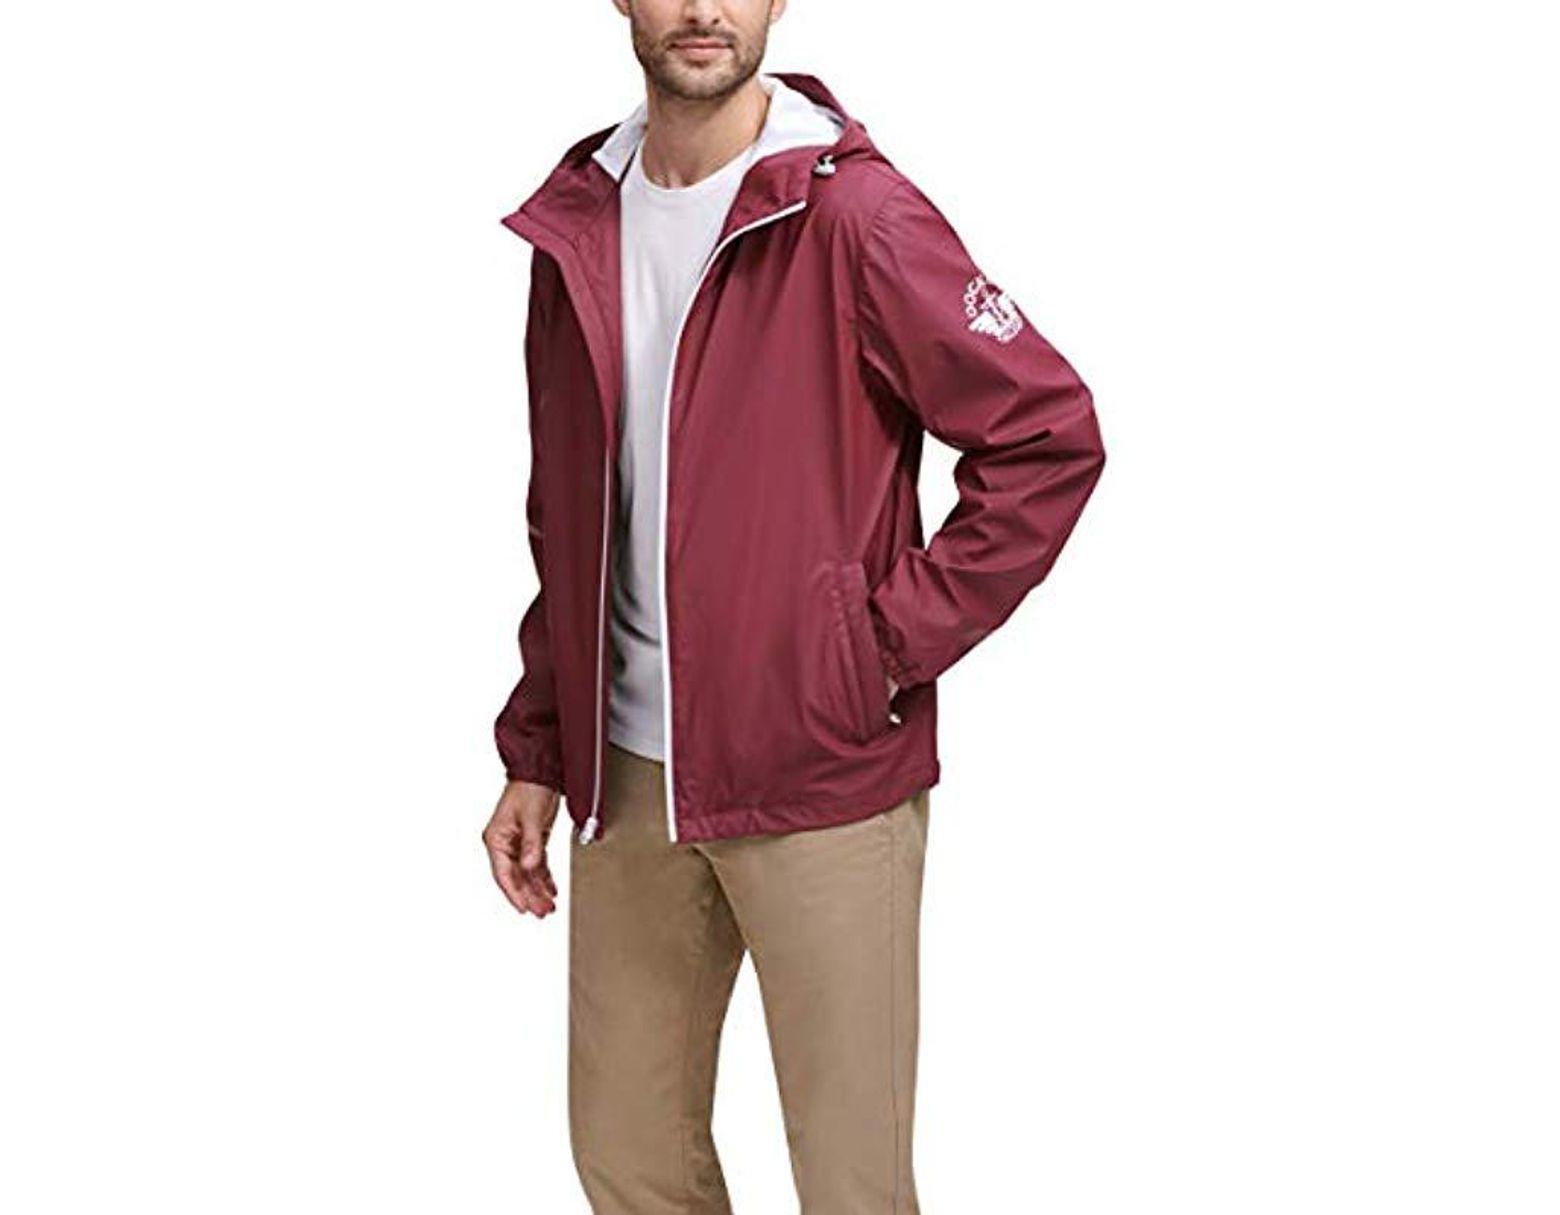 Dockers Mens The Shawn Waterproof Rain Slicker Jacket